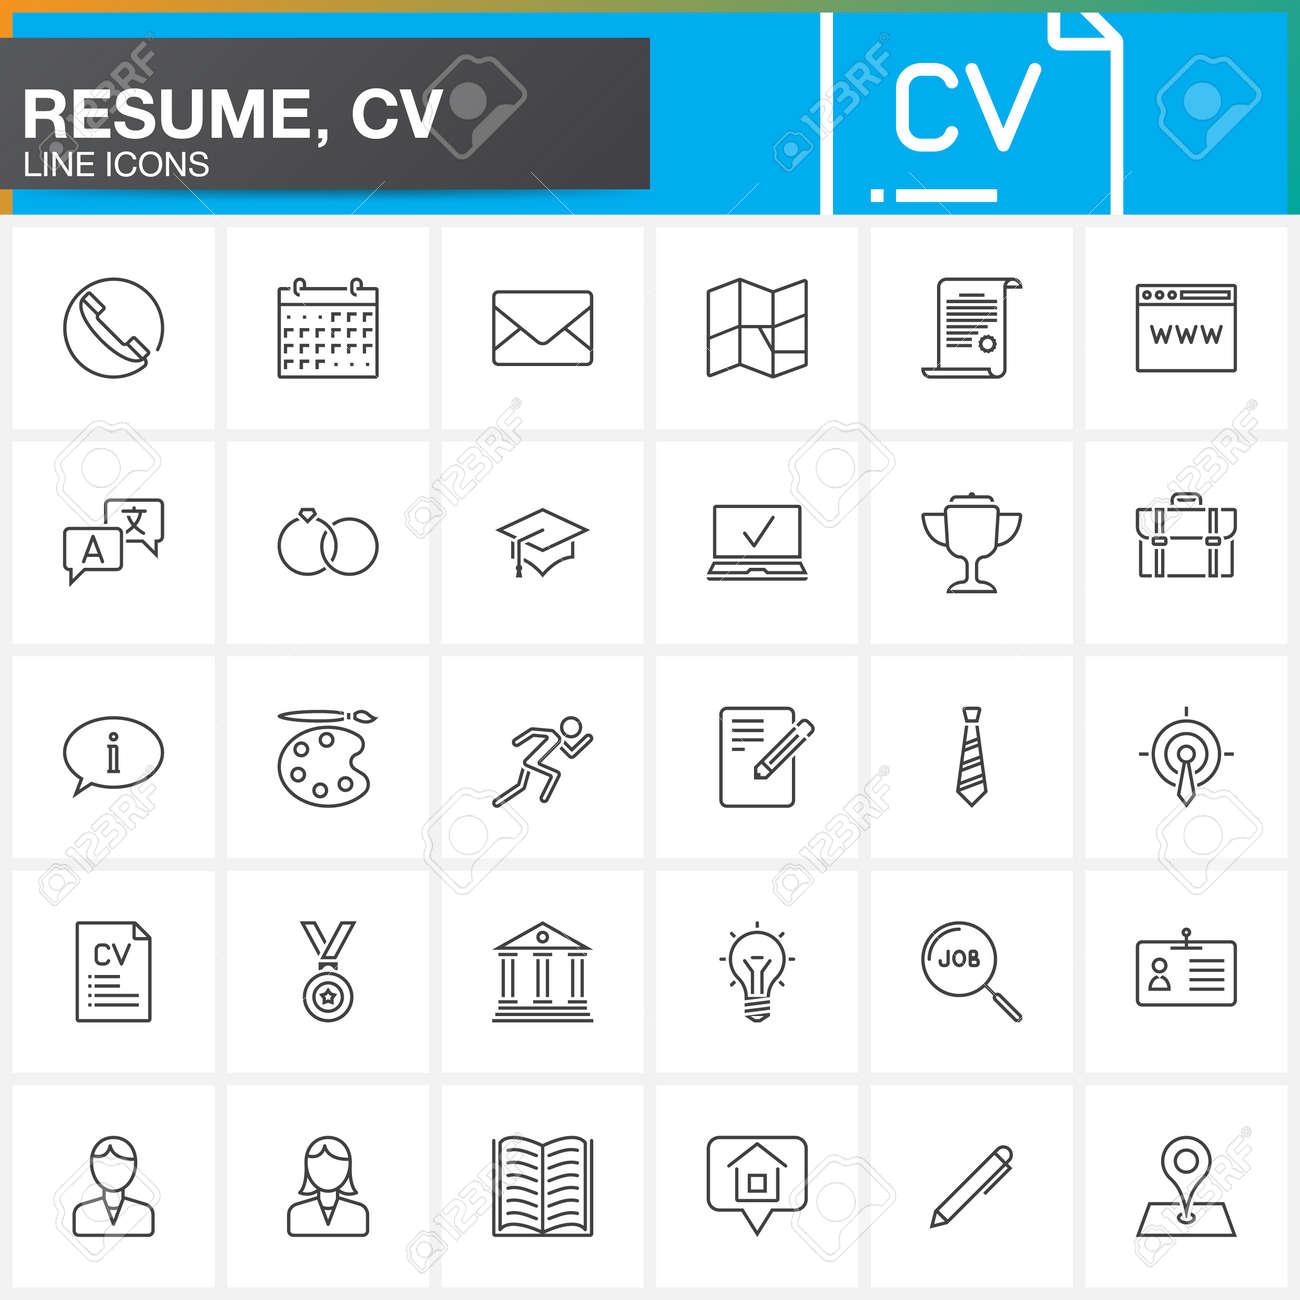 Iconos De Linea Establecidos Para Reanudar O Cv Coleccion De